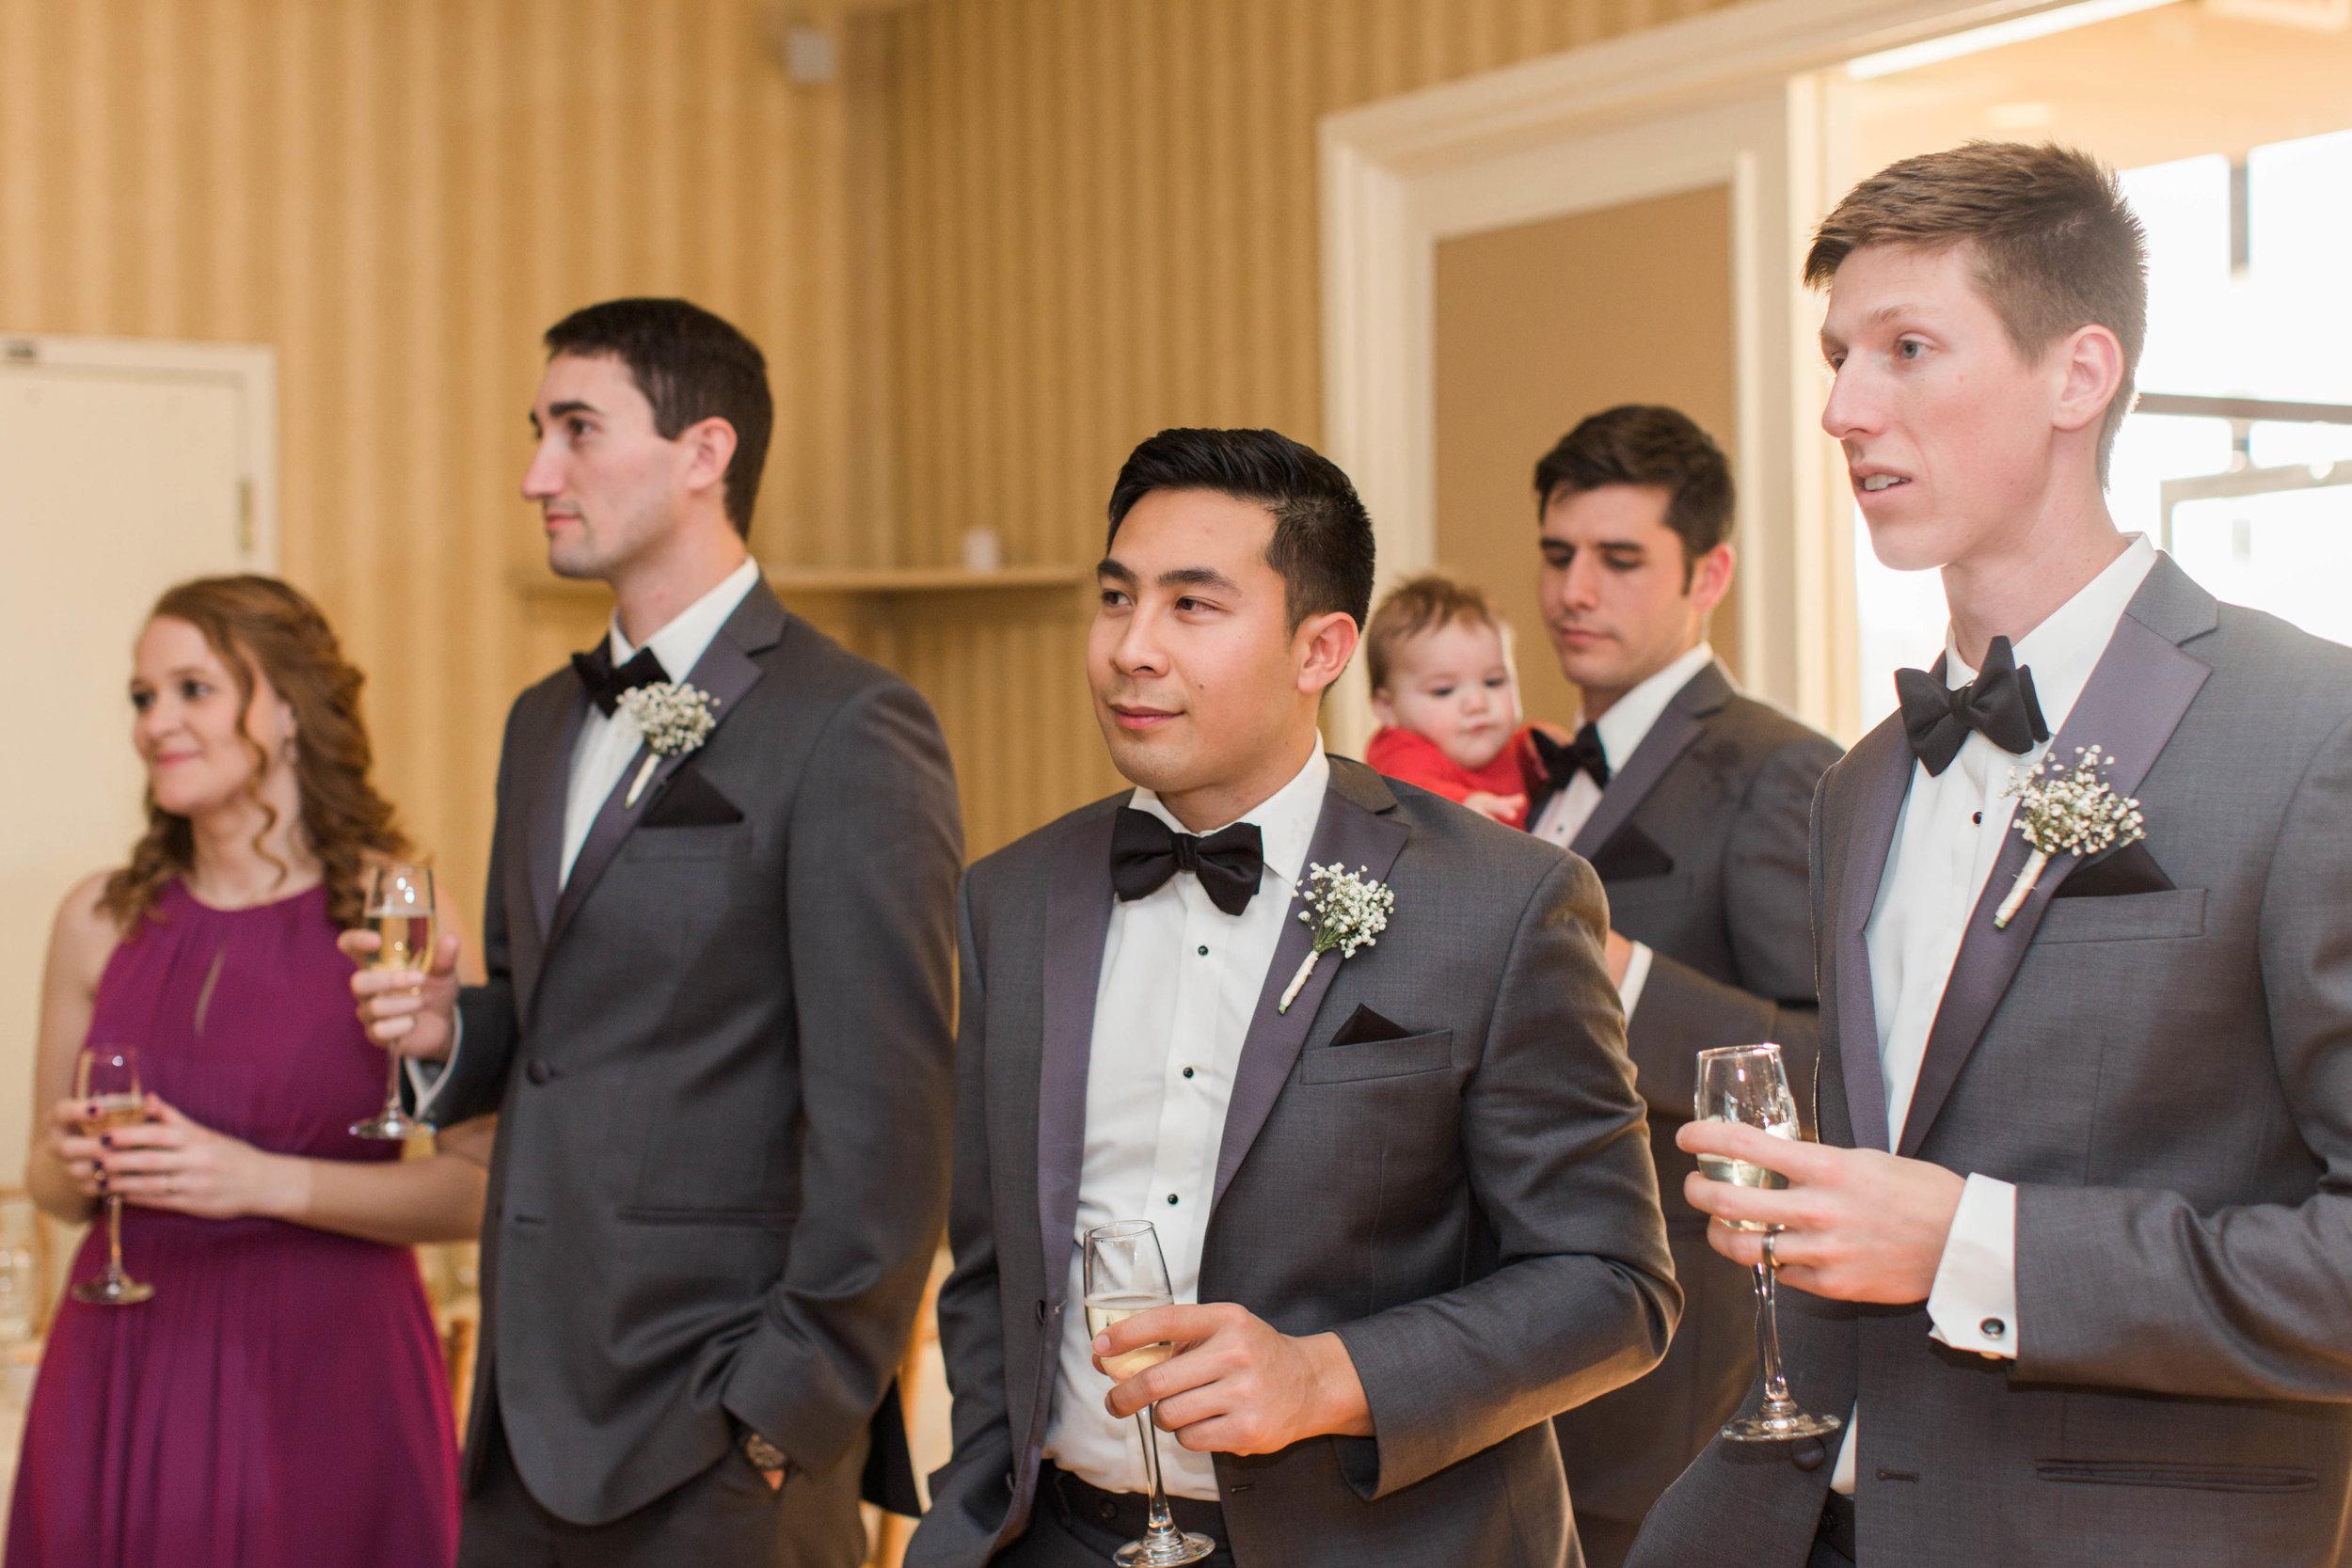 Beaumont Texas Country Club wedding-6198.jpg